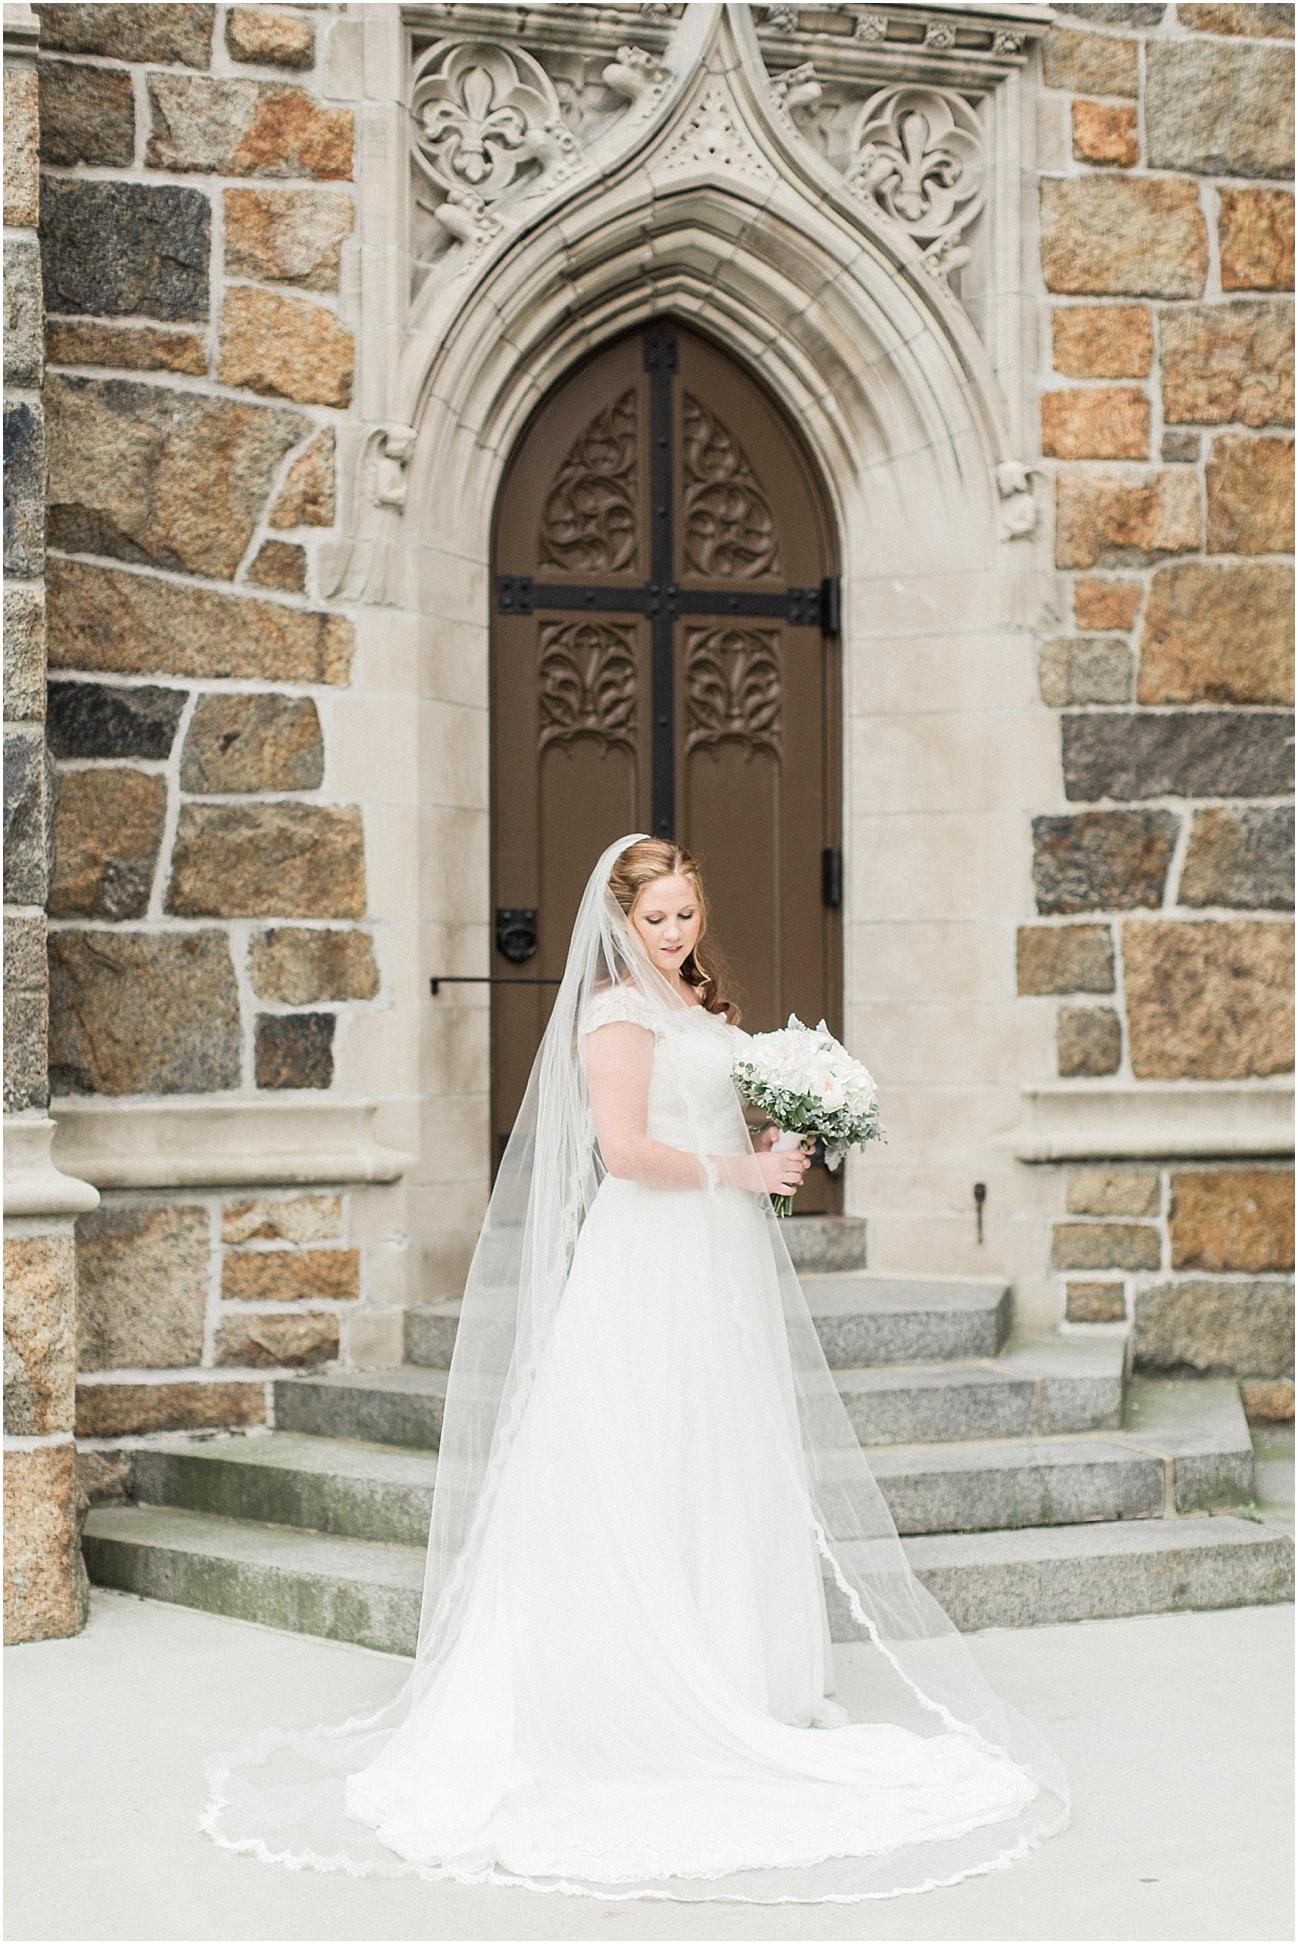 jaclyn_adam_st_ann_brendans_dorchester_southie_castle_bride_groom_venezia_waterfront__cape_cod_boston_wedding_photographer_meredith_jane_photography_photo_0907.jpg